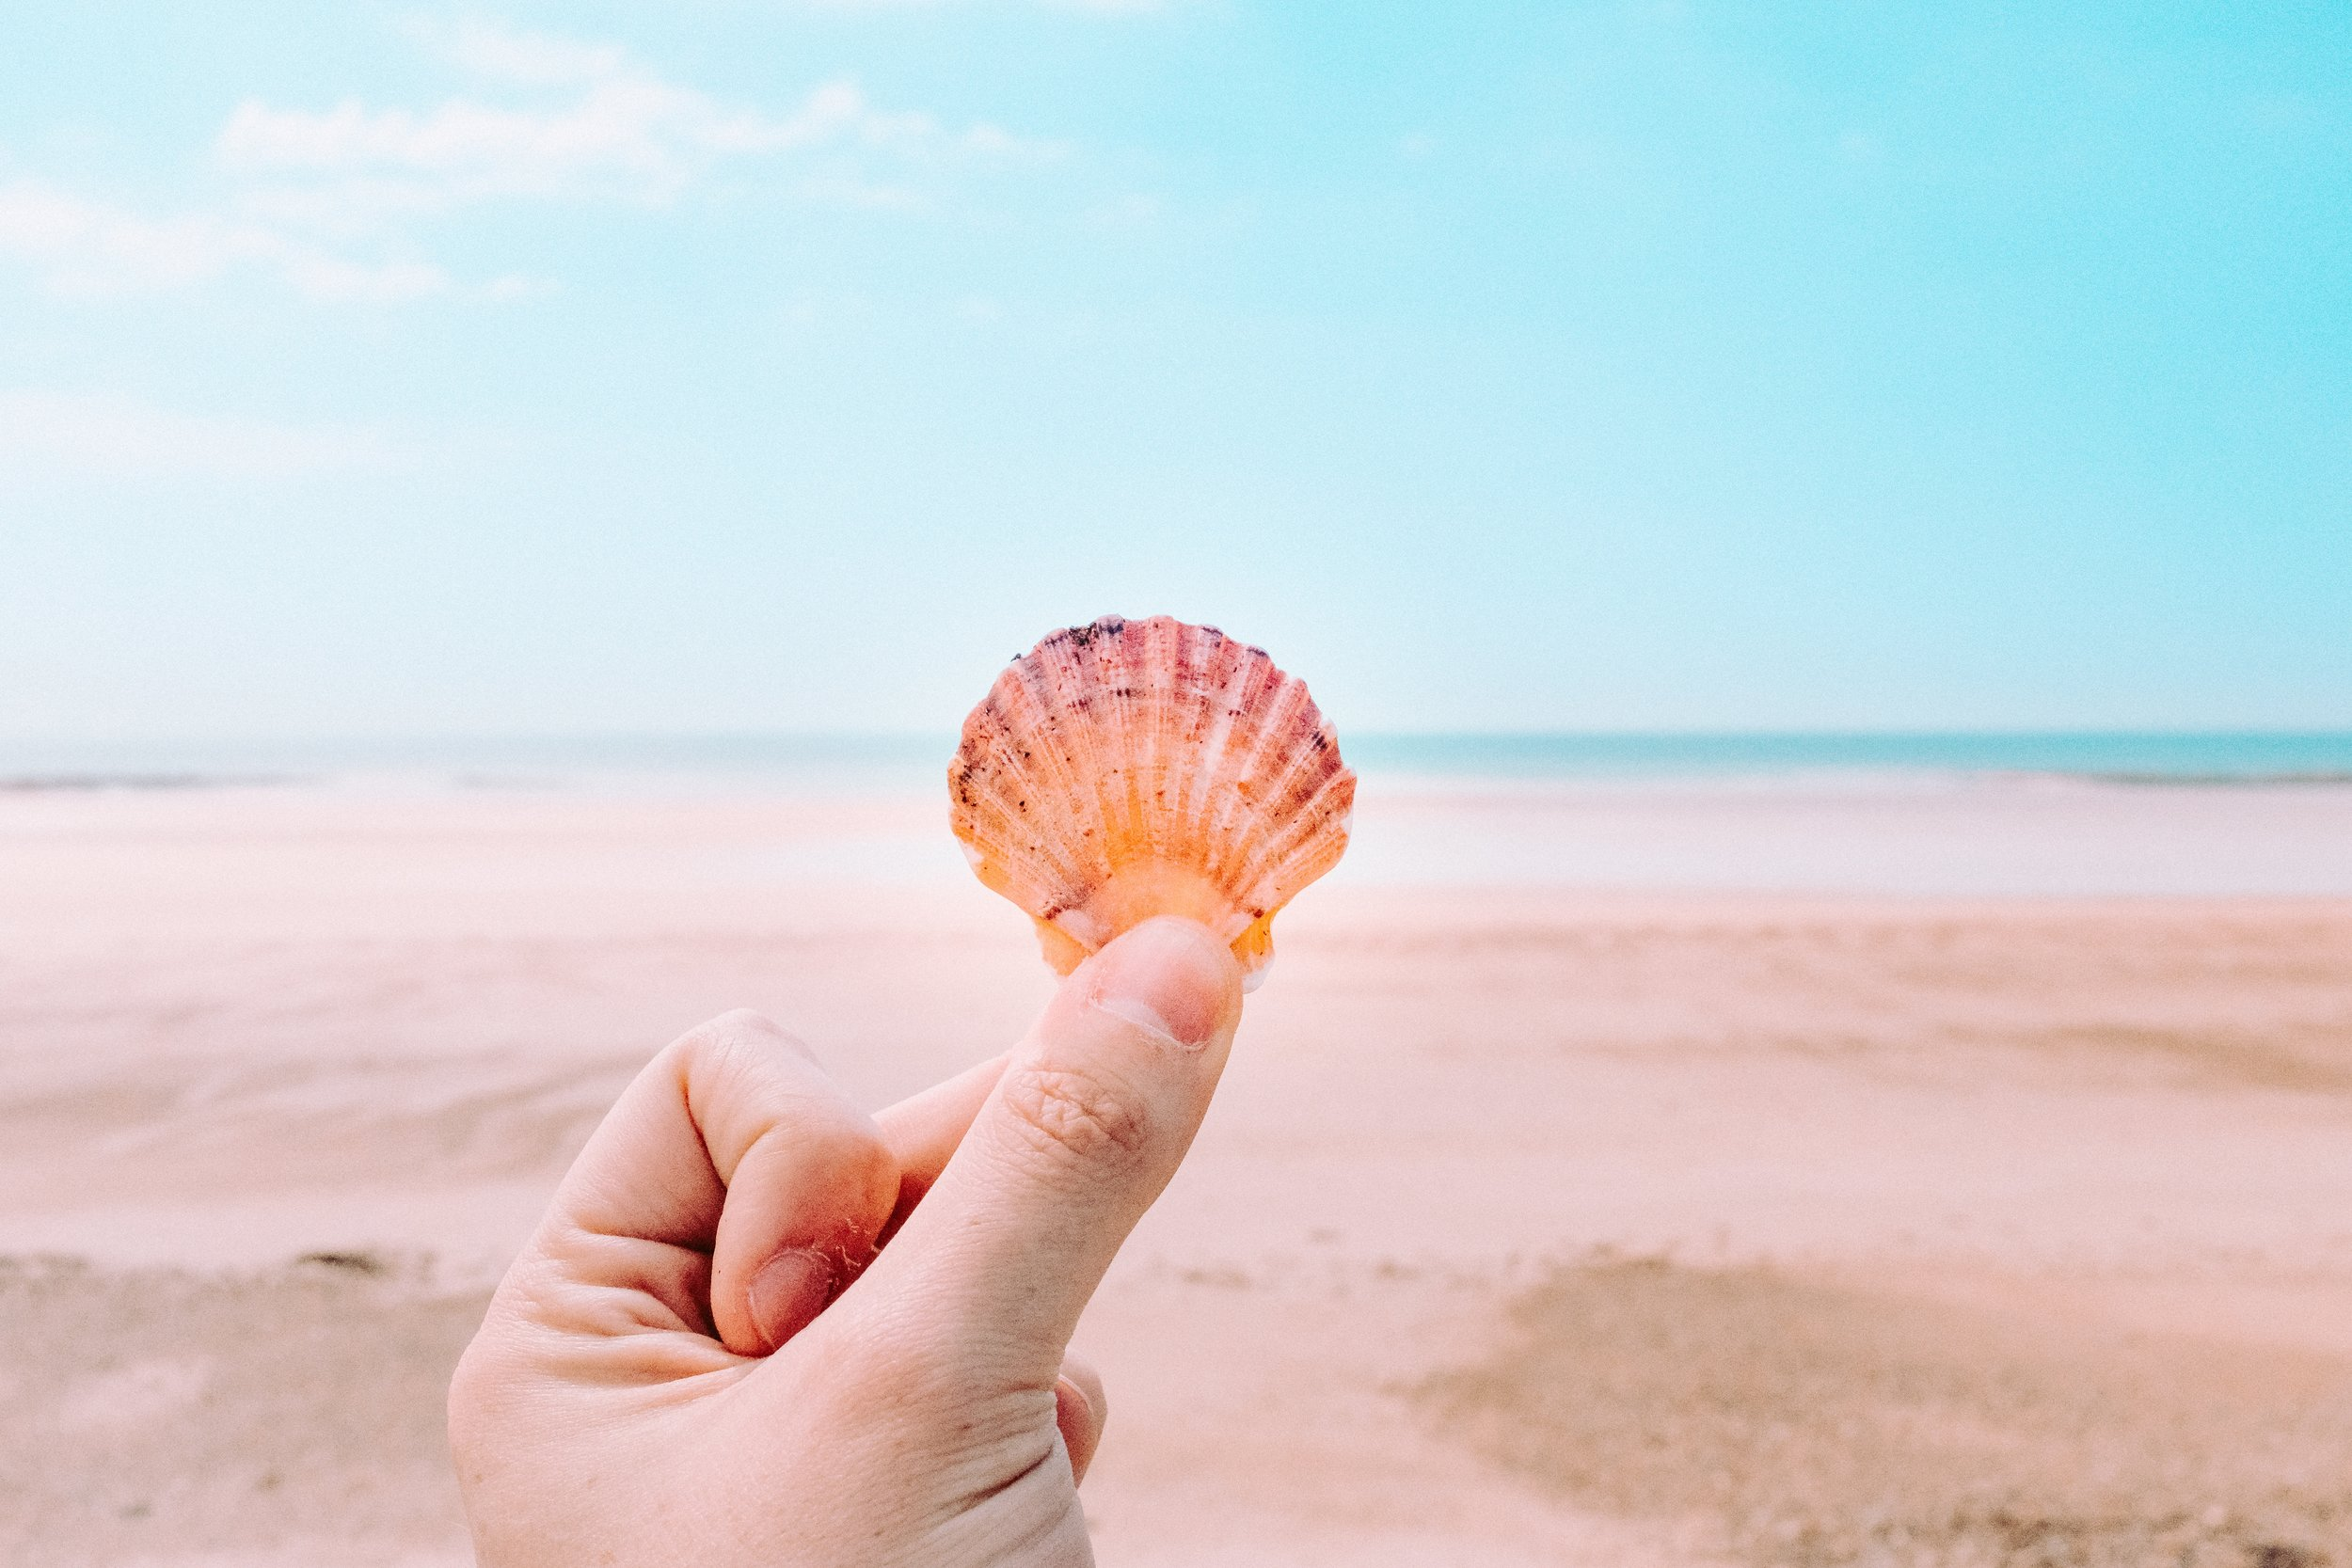 Project Seashell - SENDING THE SEA LOVE. NOT PLASTIC.